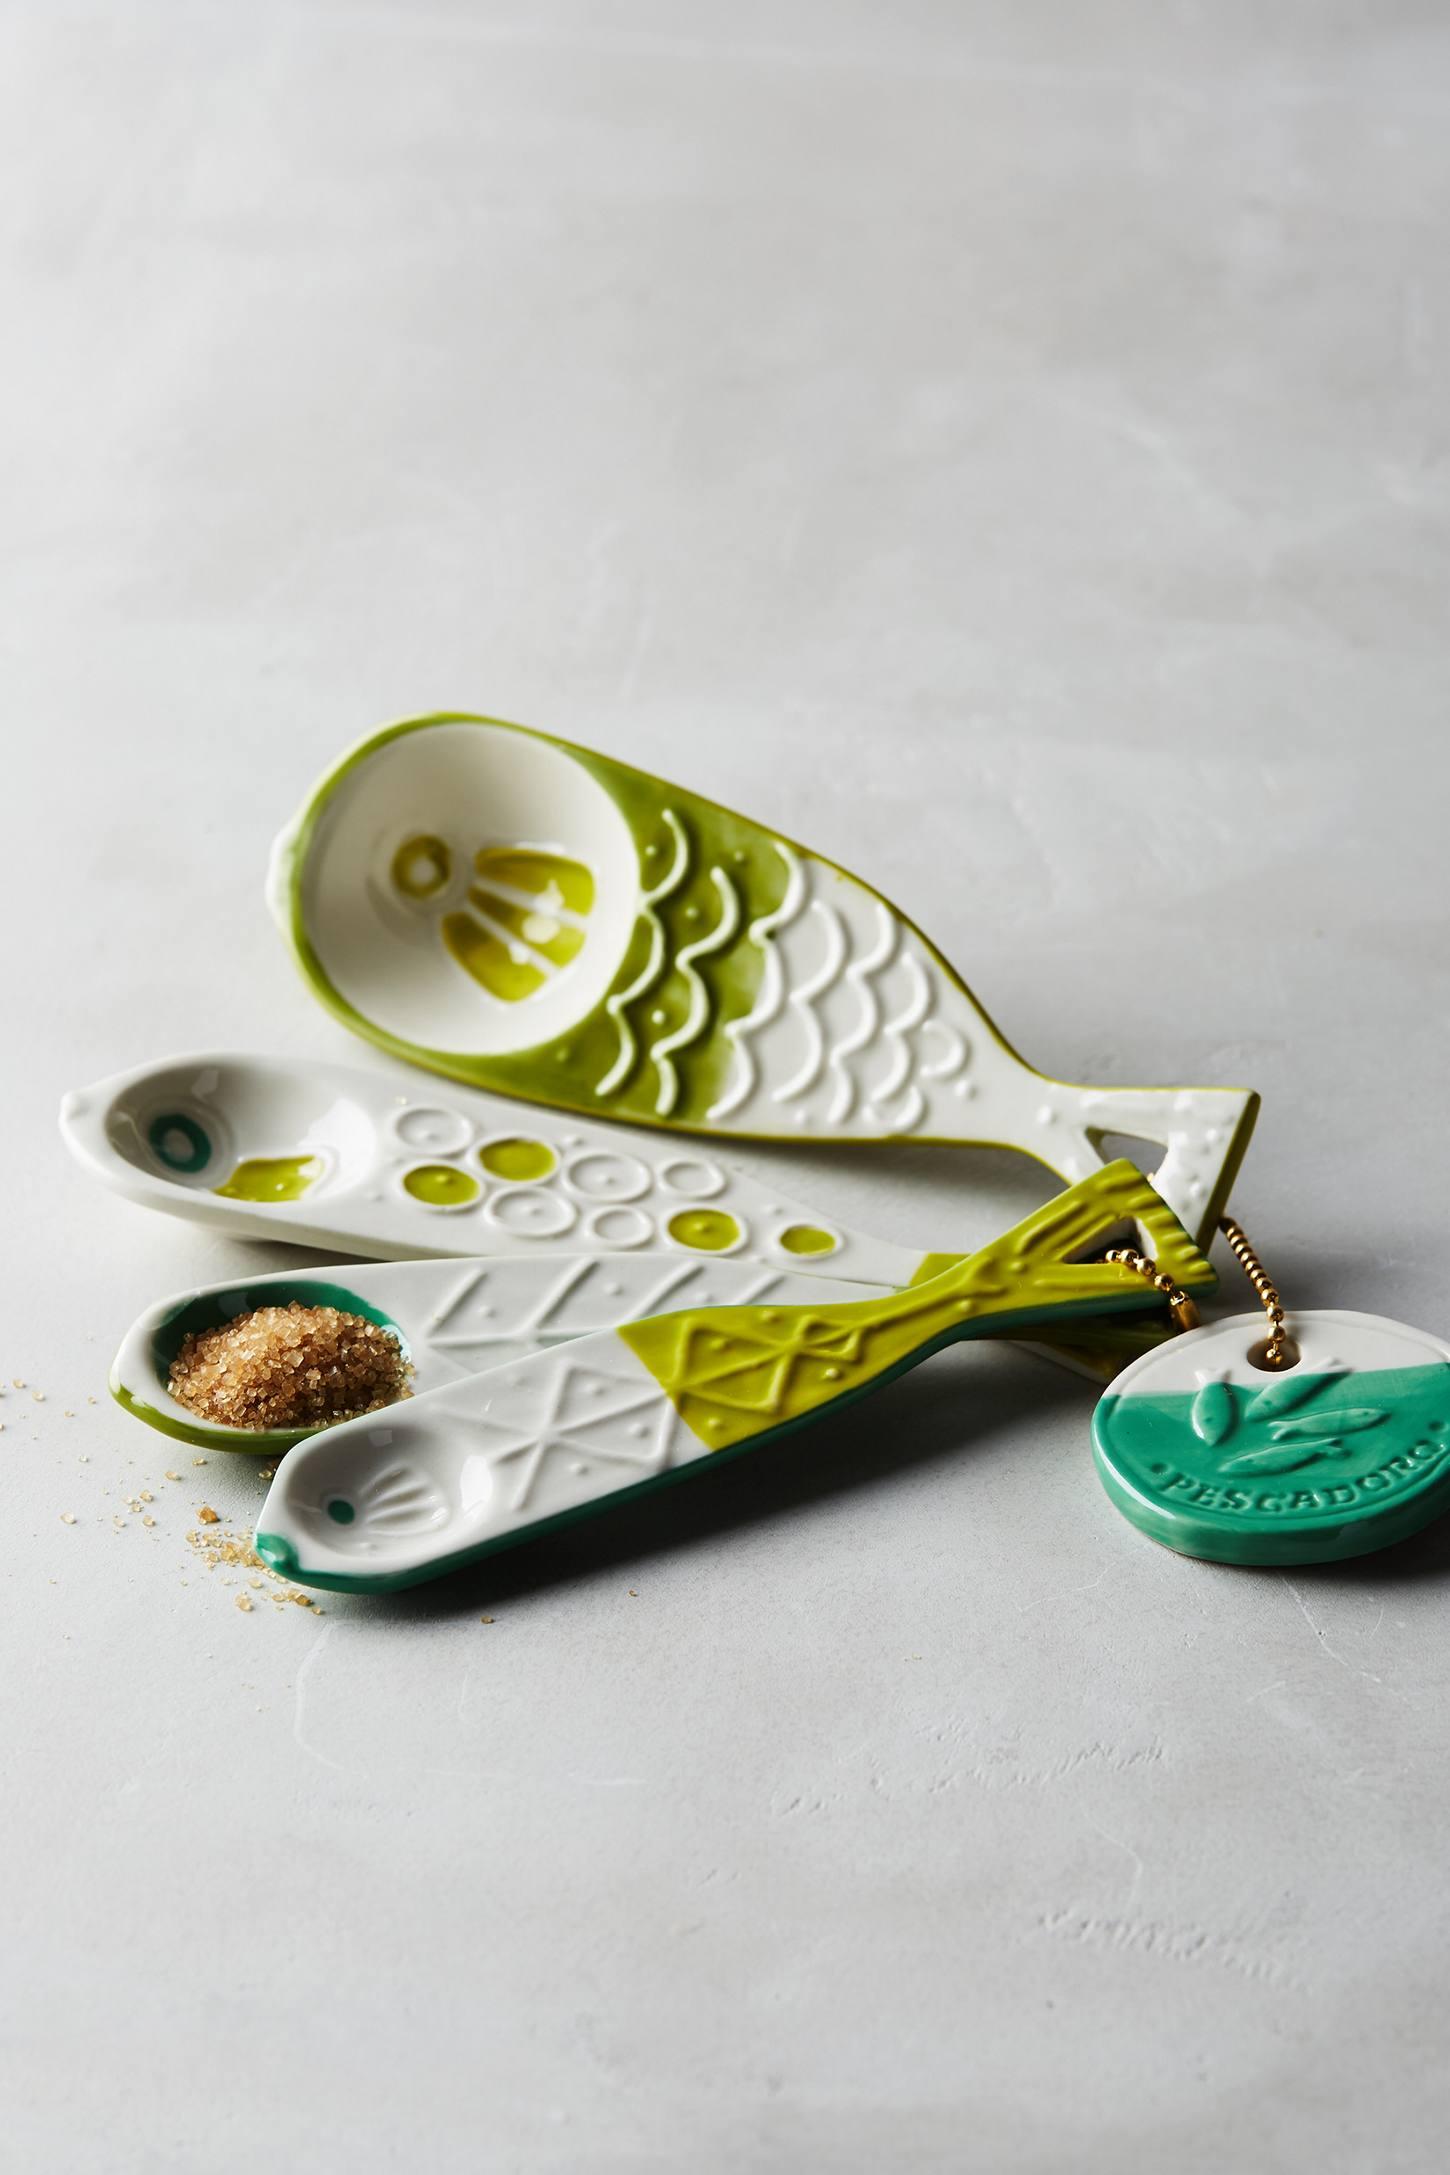 Pescadoro Measuring Spoons